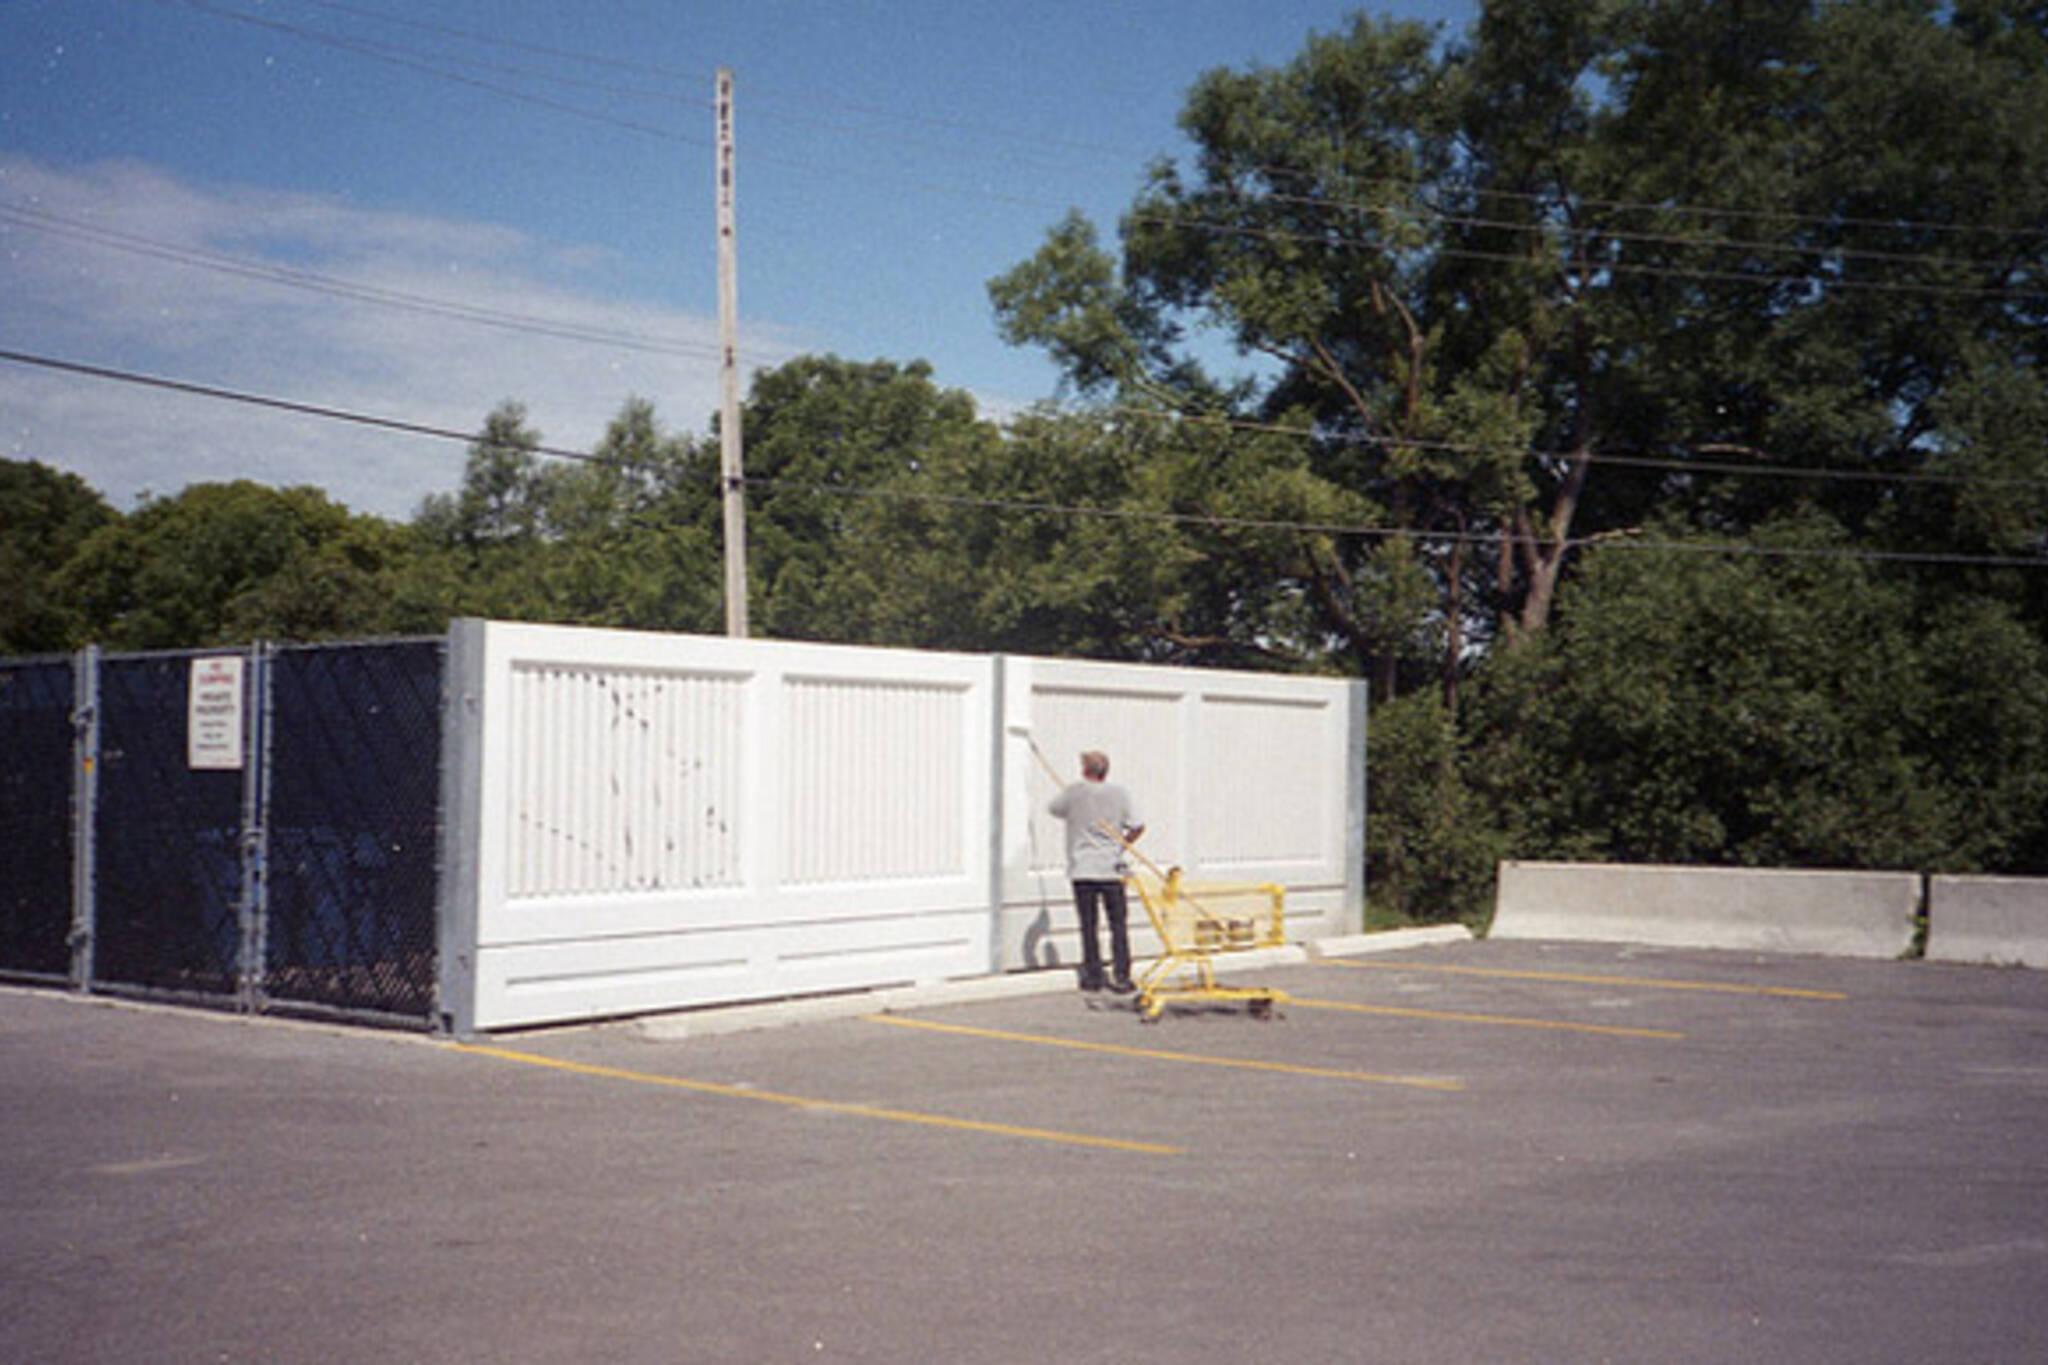 painting, car lot, parking